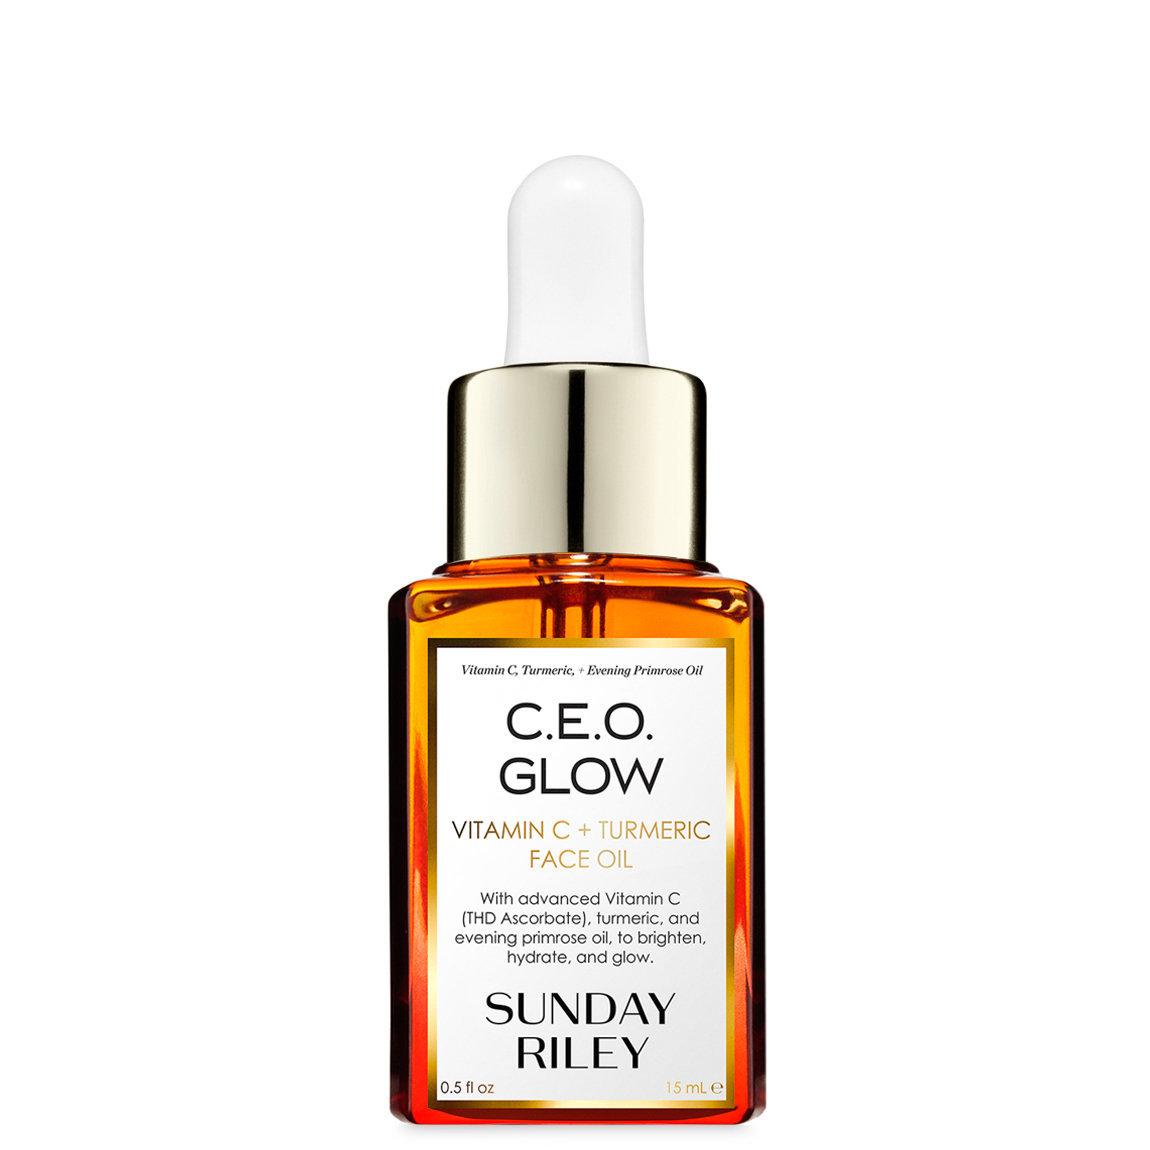 Sunday Riley C.E.O. Glow Vitamin C + Turmeric Face Oil 15 ml alternative view 1 - product swatch.